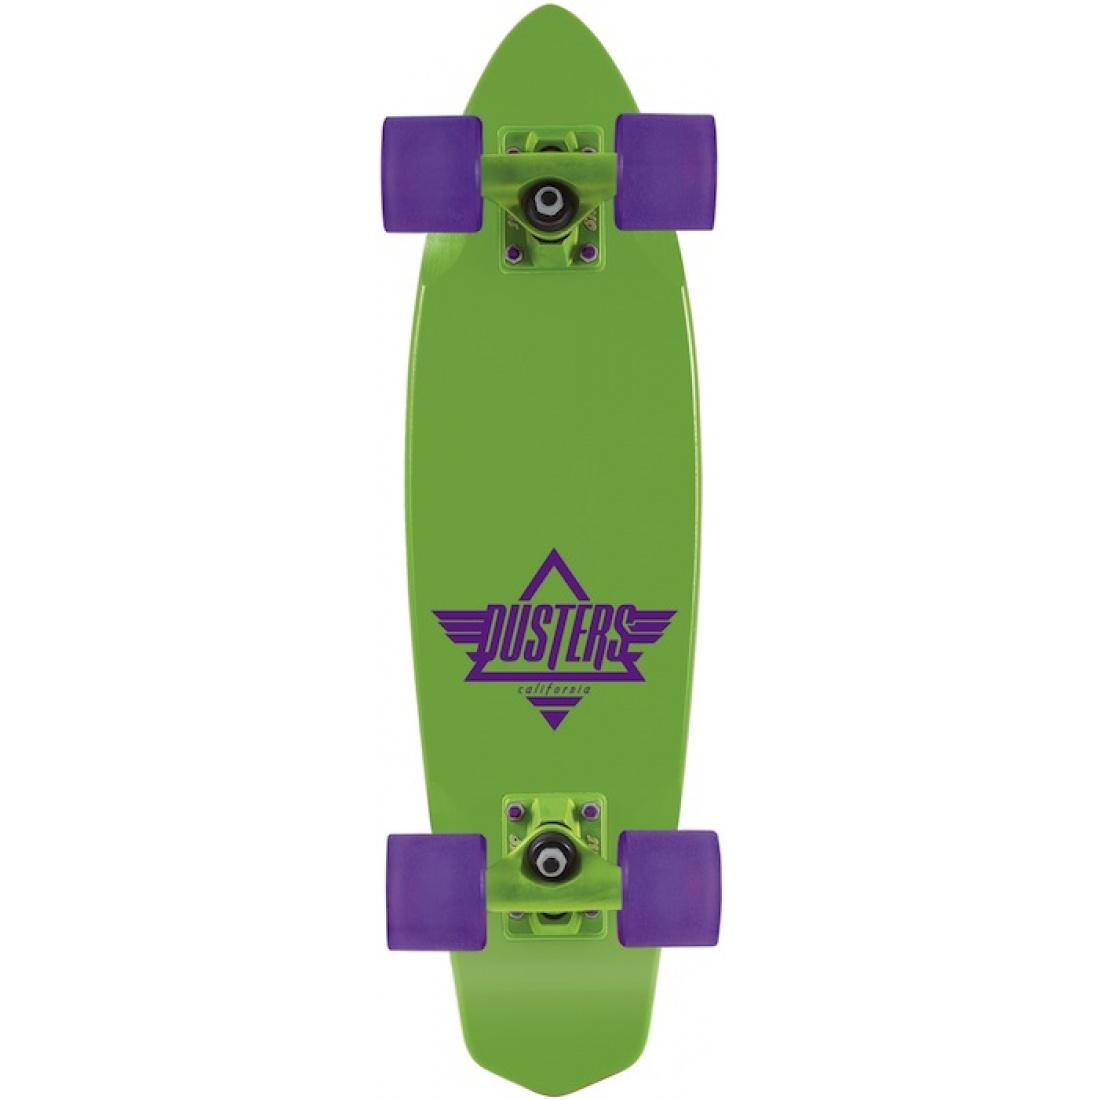 "DUS-Ace Cruiser Neon Green/Purple 24"" Cruiser"